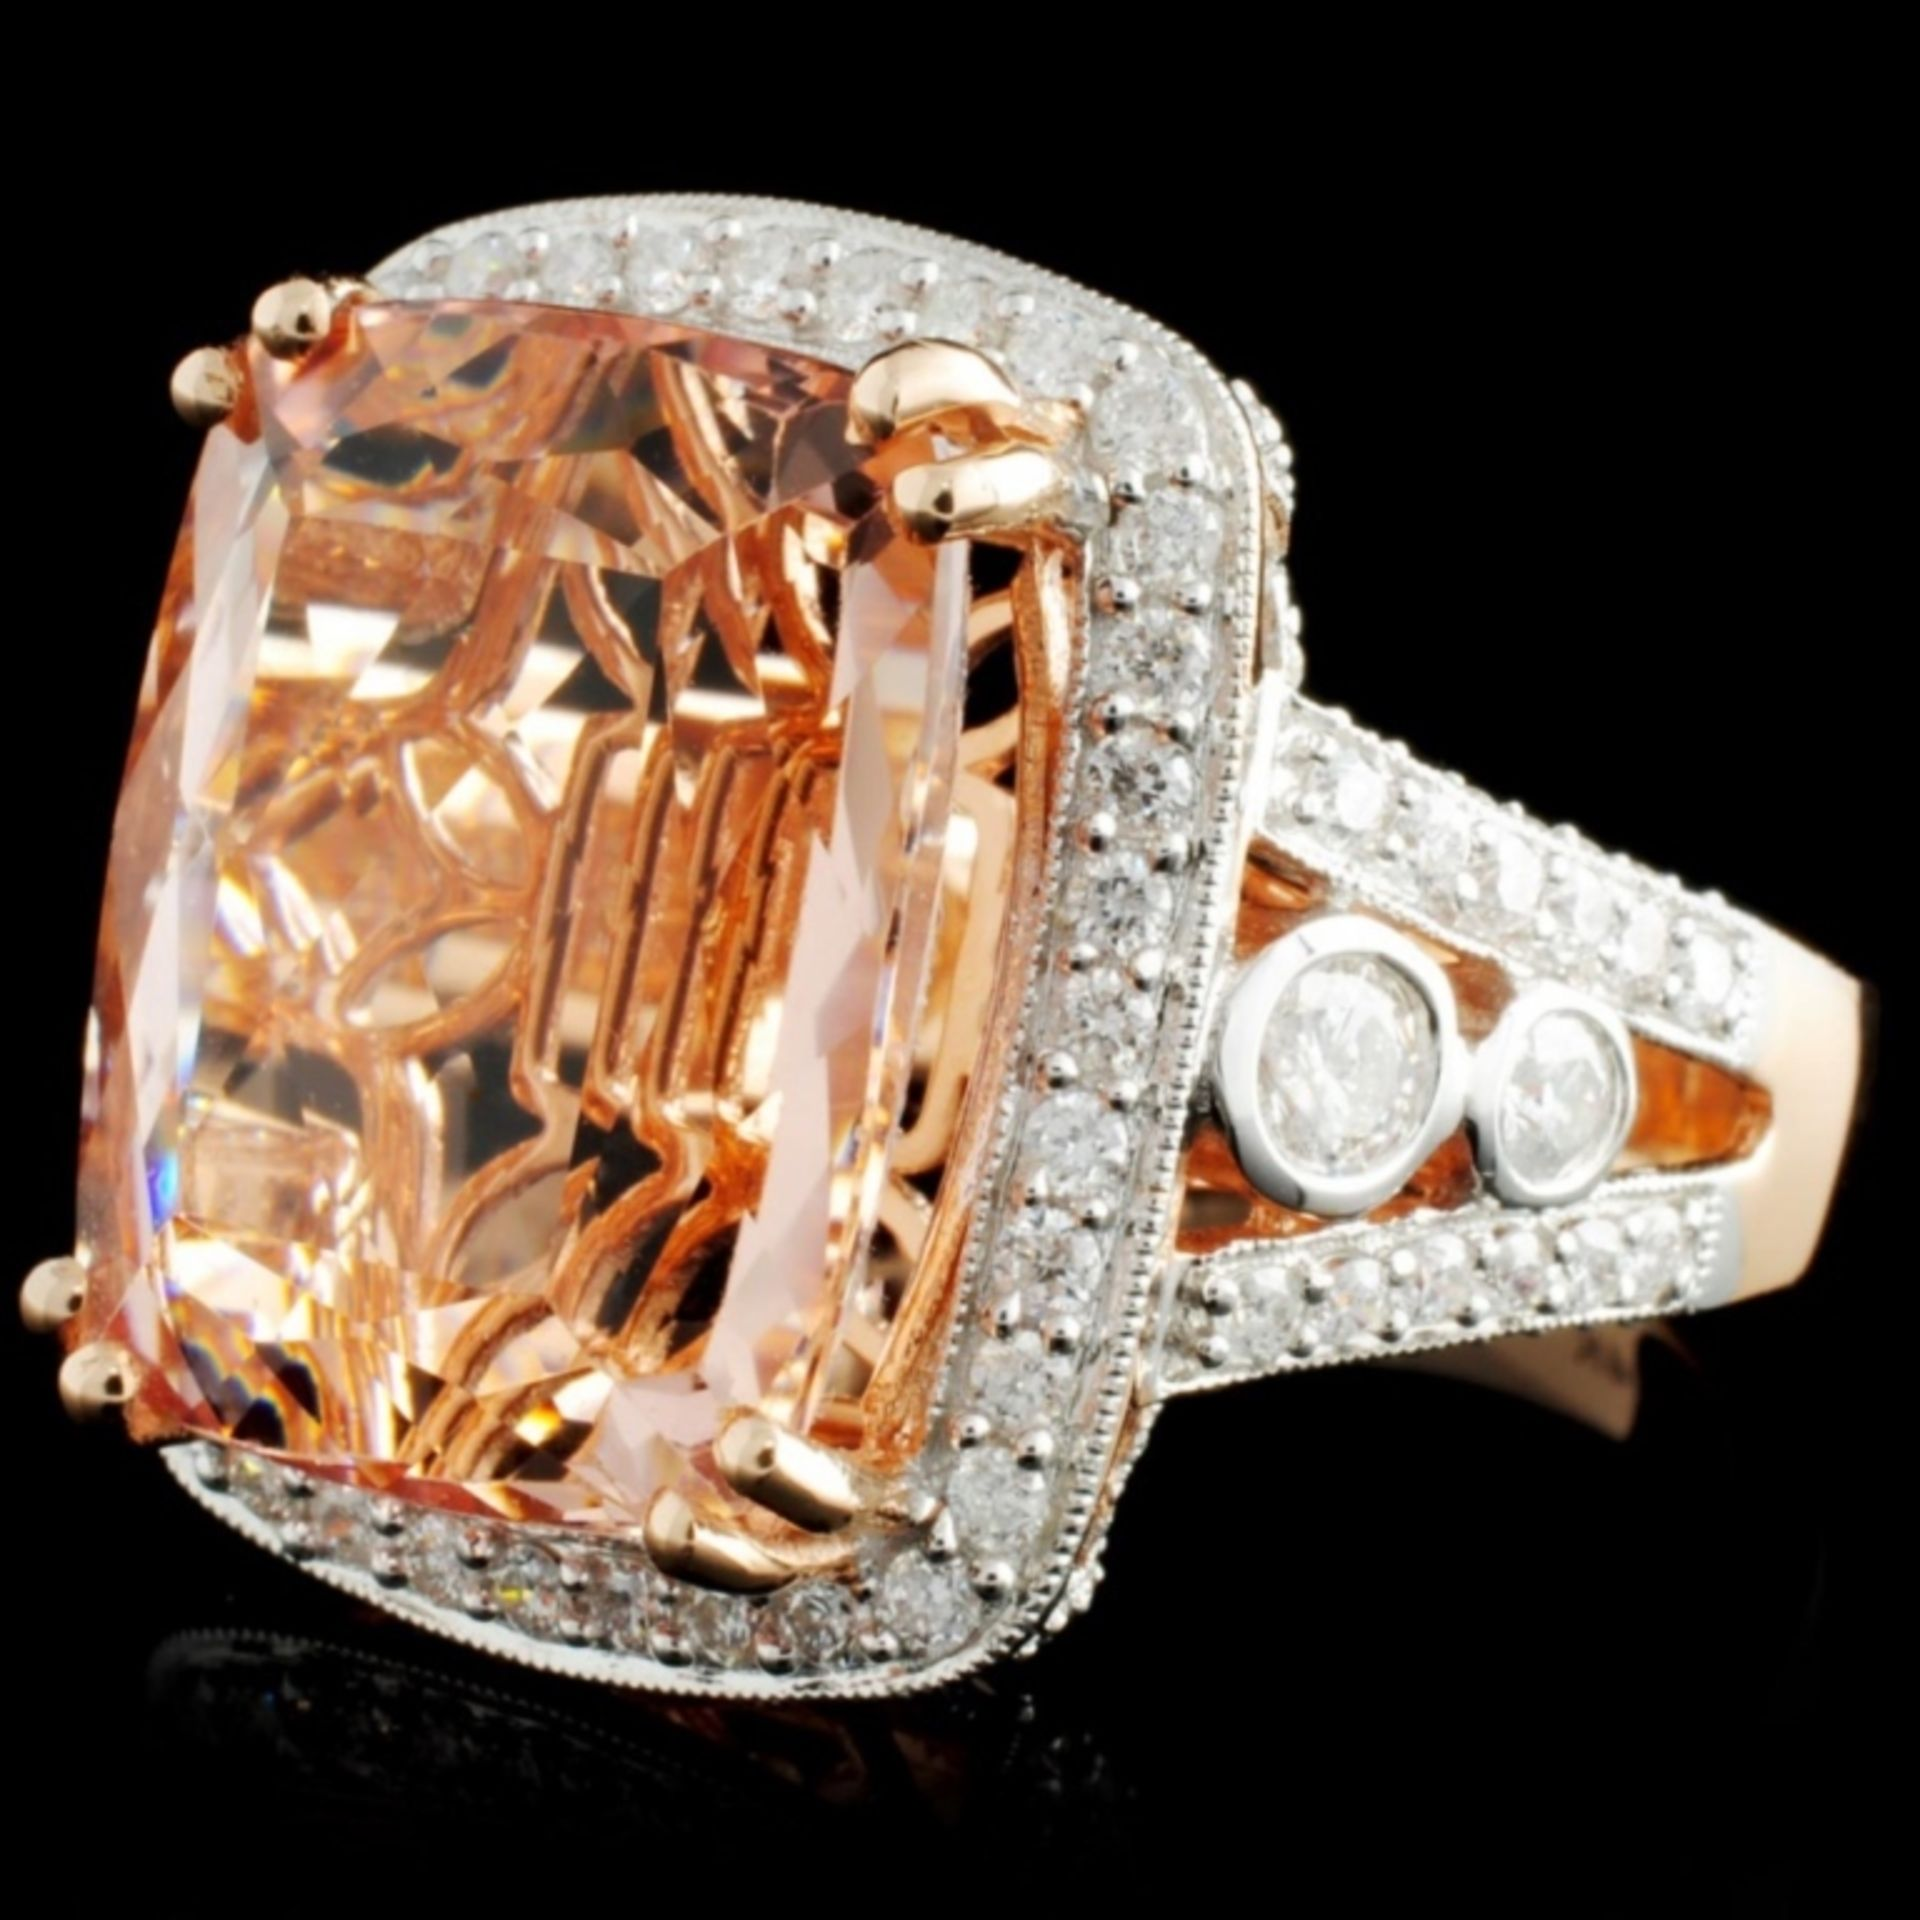 14K Rose Gold 13.88ct Morganite & 1.53ct Diamond R - Image 2 of 4